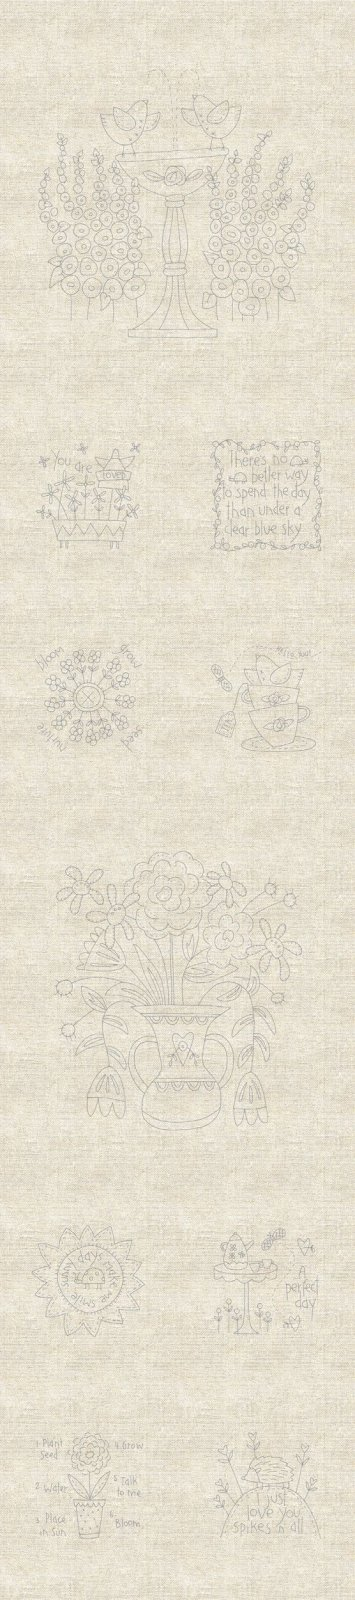 DV3973 Blume and Grow Stitchery Panel